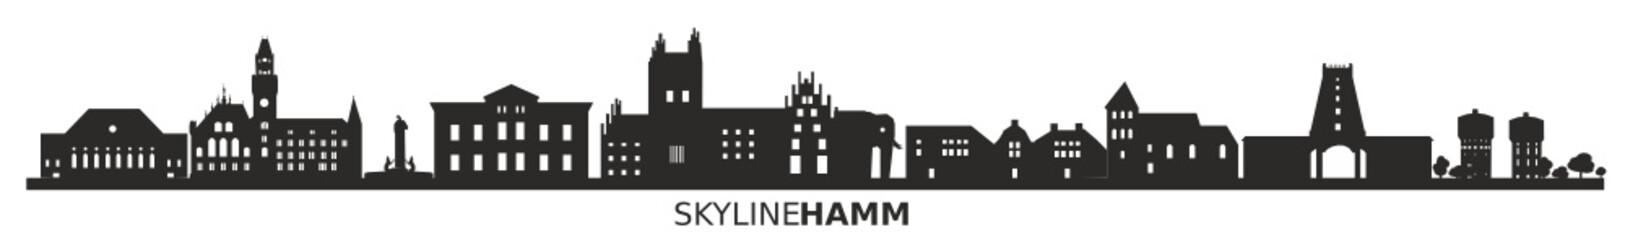 Skyline Hamm